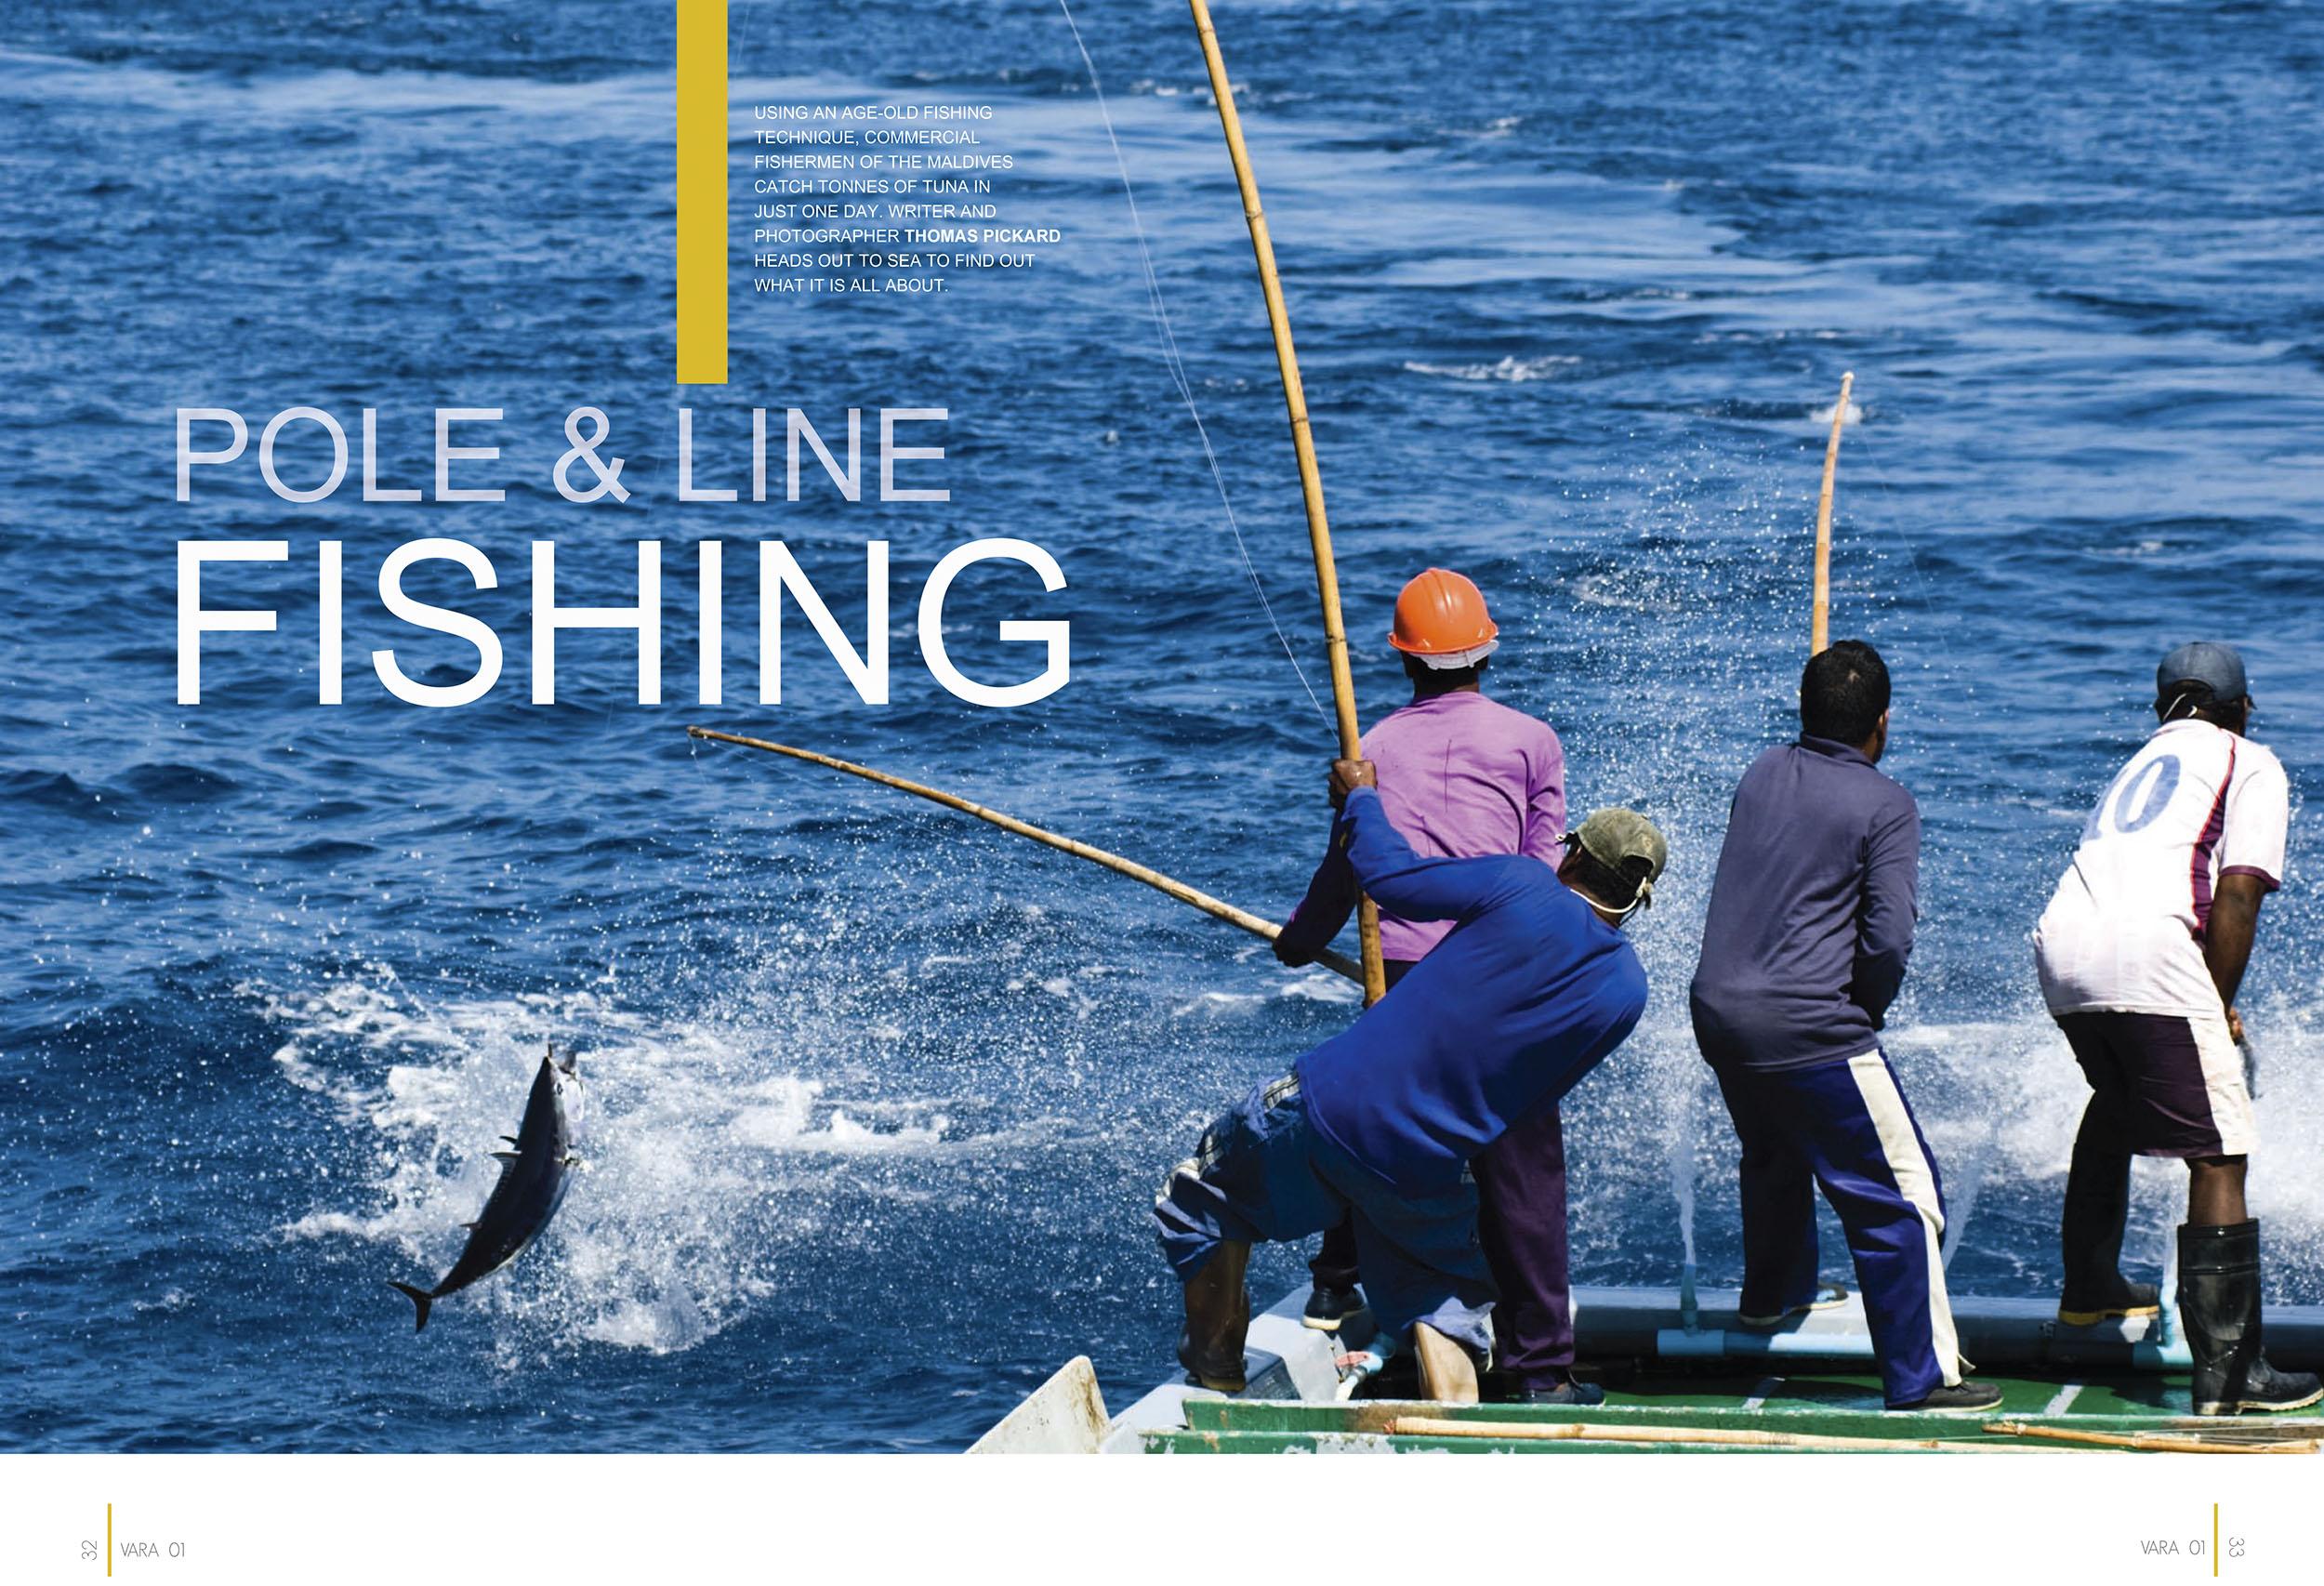 Island Aviation Vara Magazine. Pole and Line Fishing article. Wo